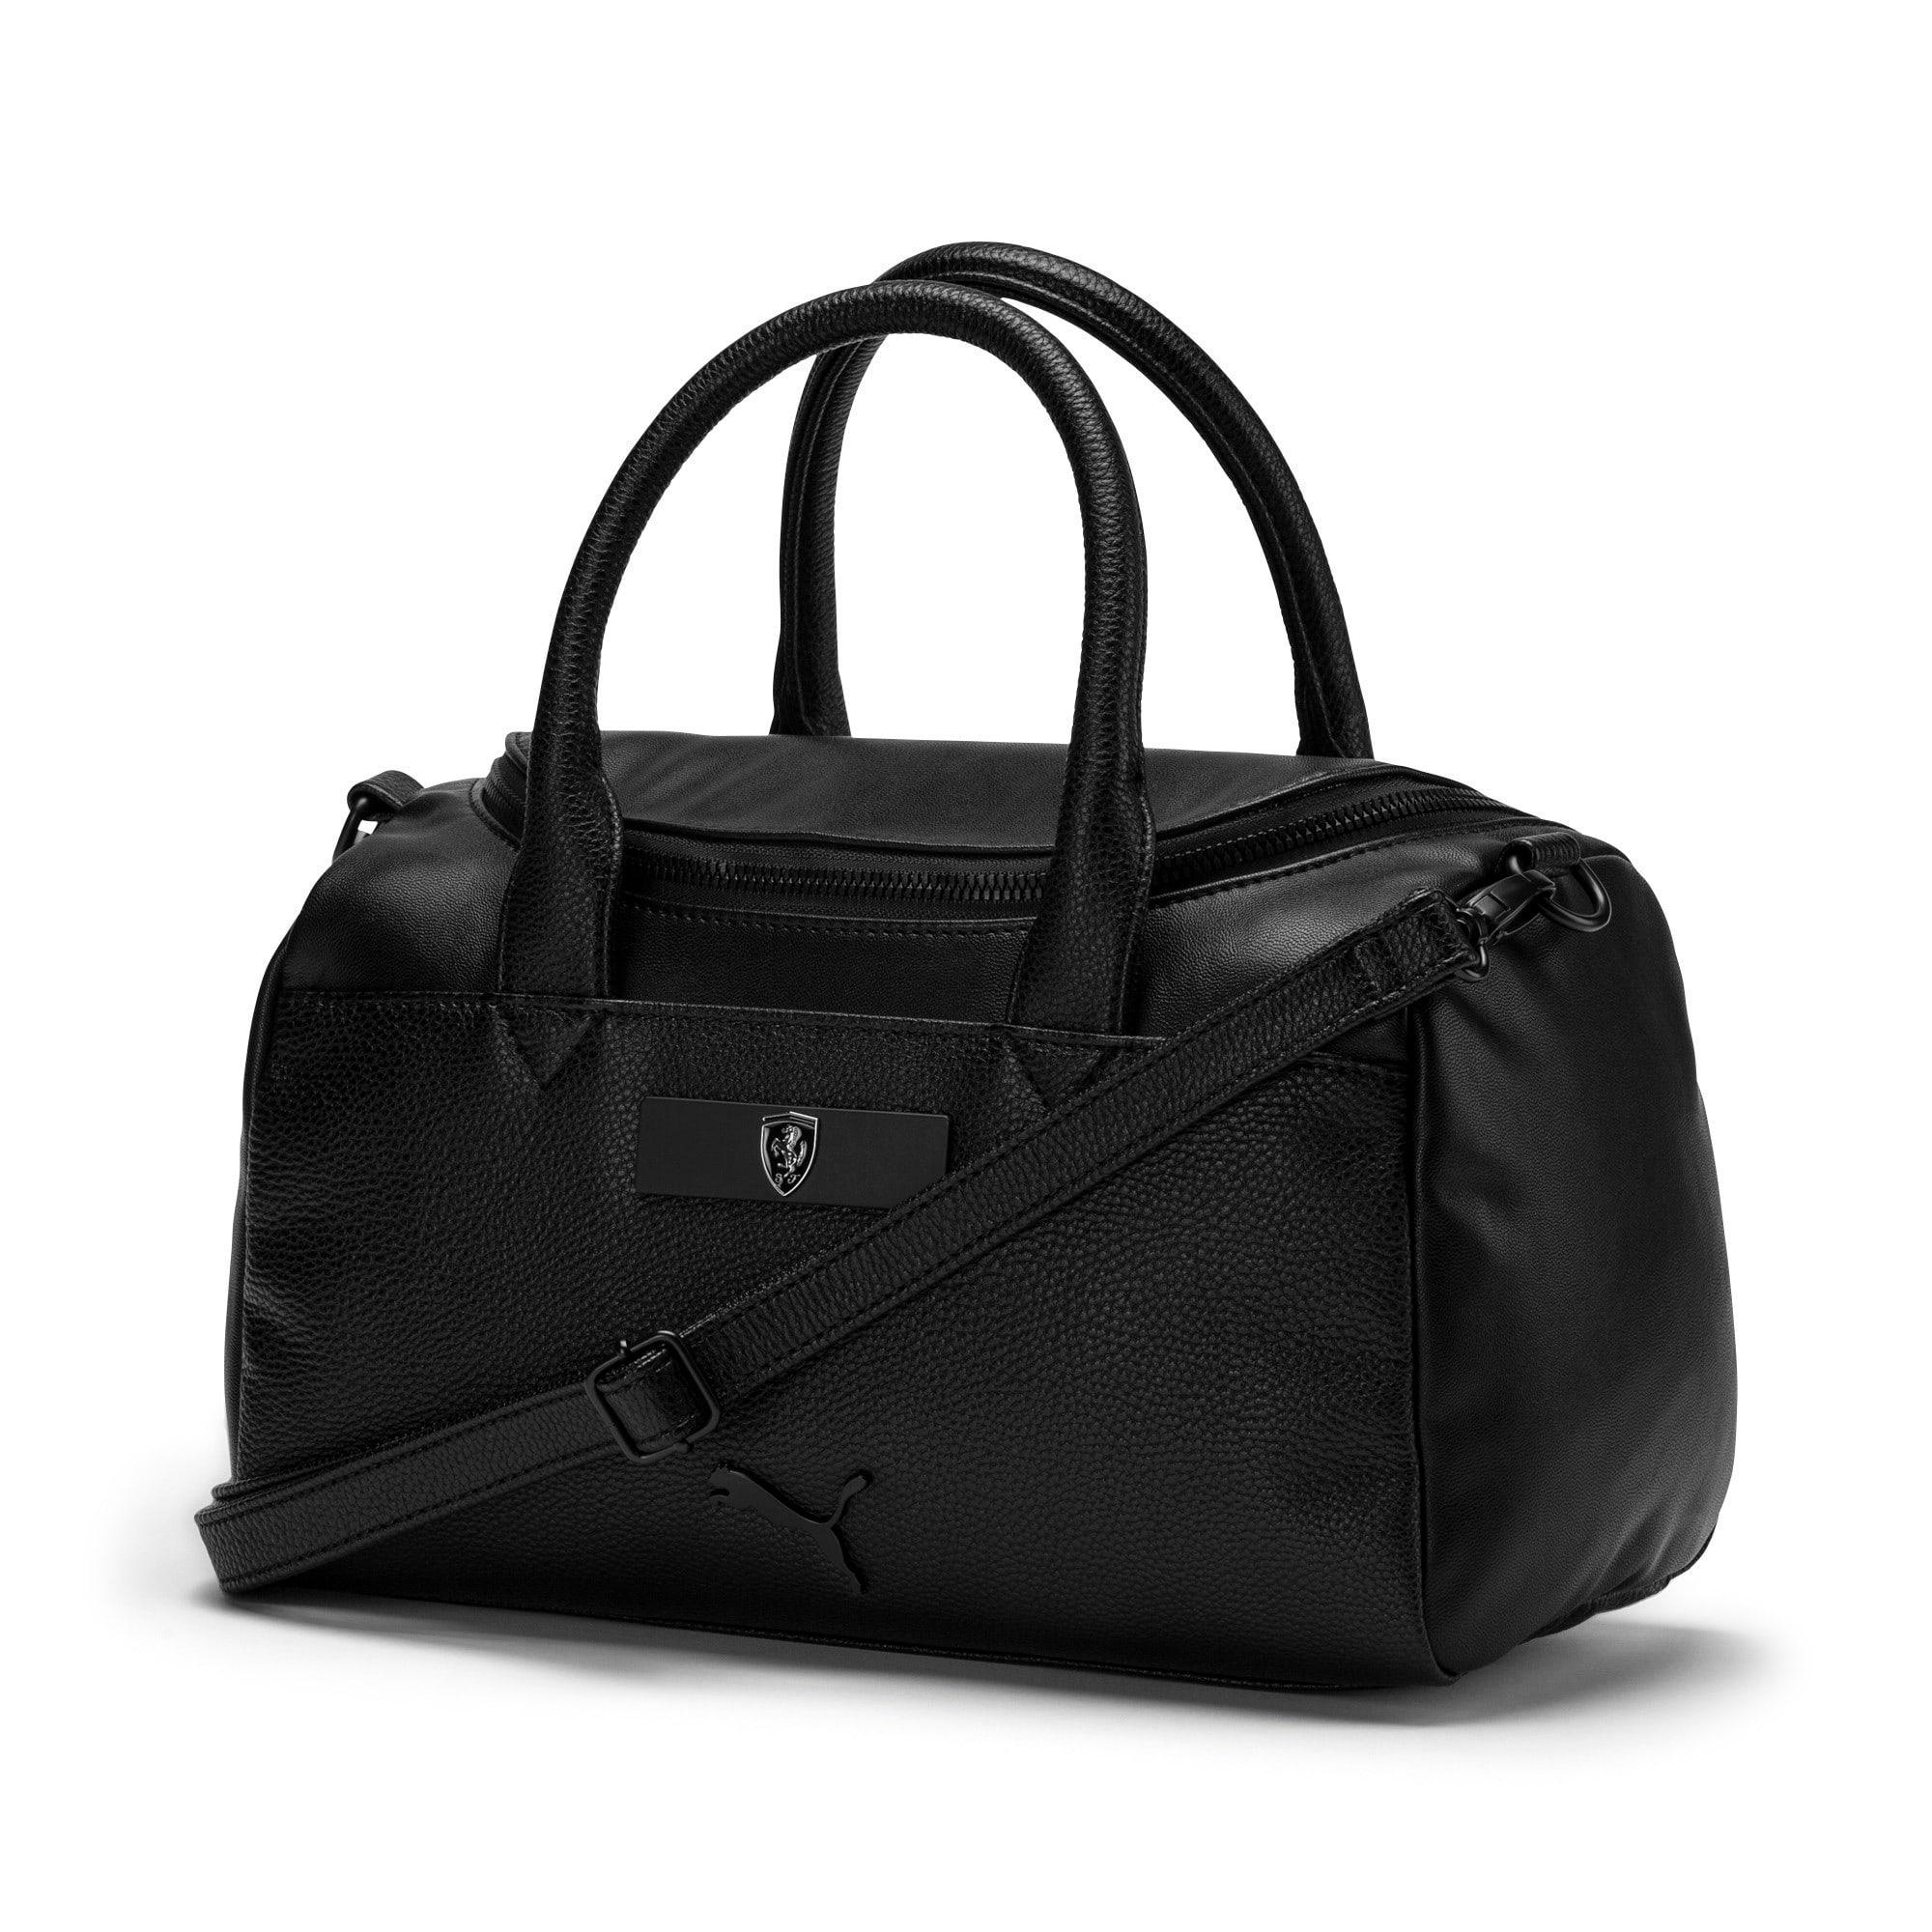 Thumbnail 1 of Ferrari Lifestyle Women's Handbag, Puma Black, medium